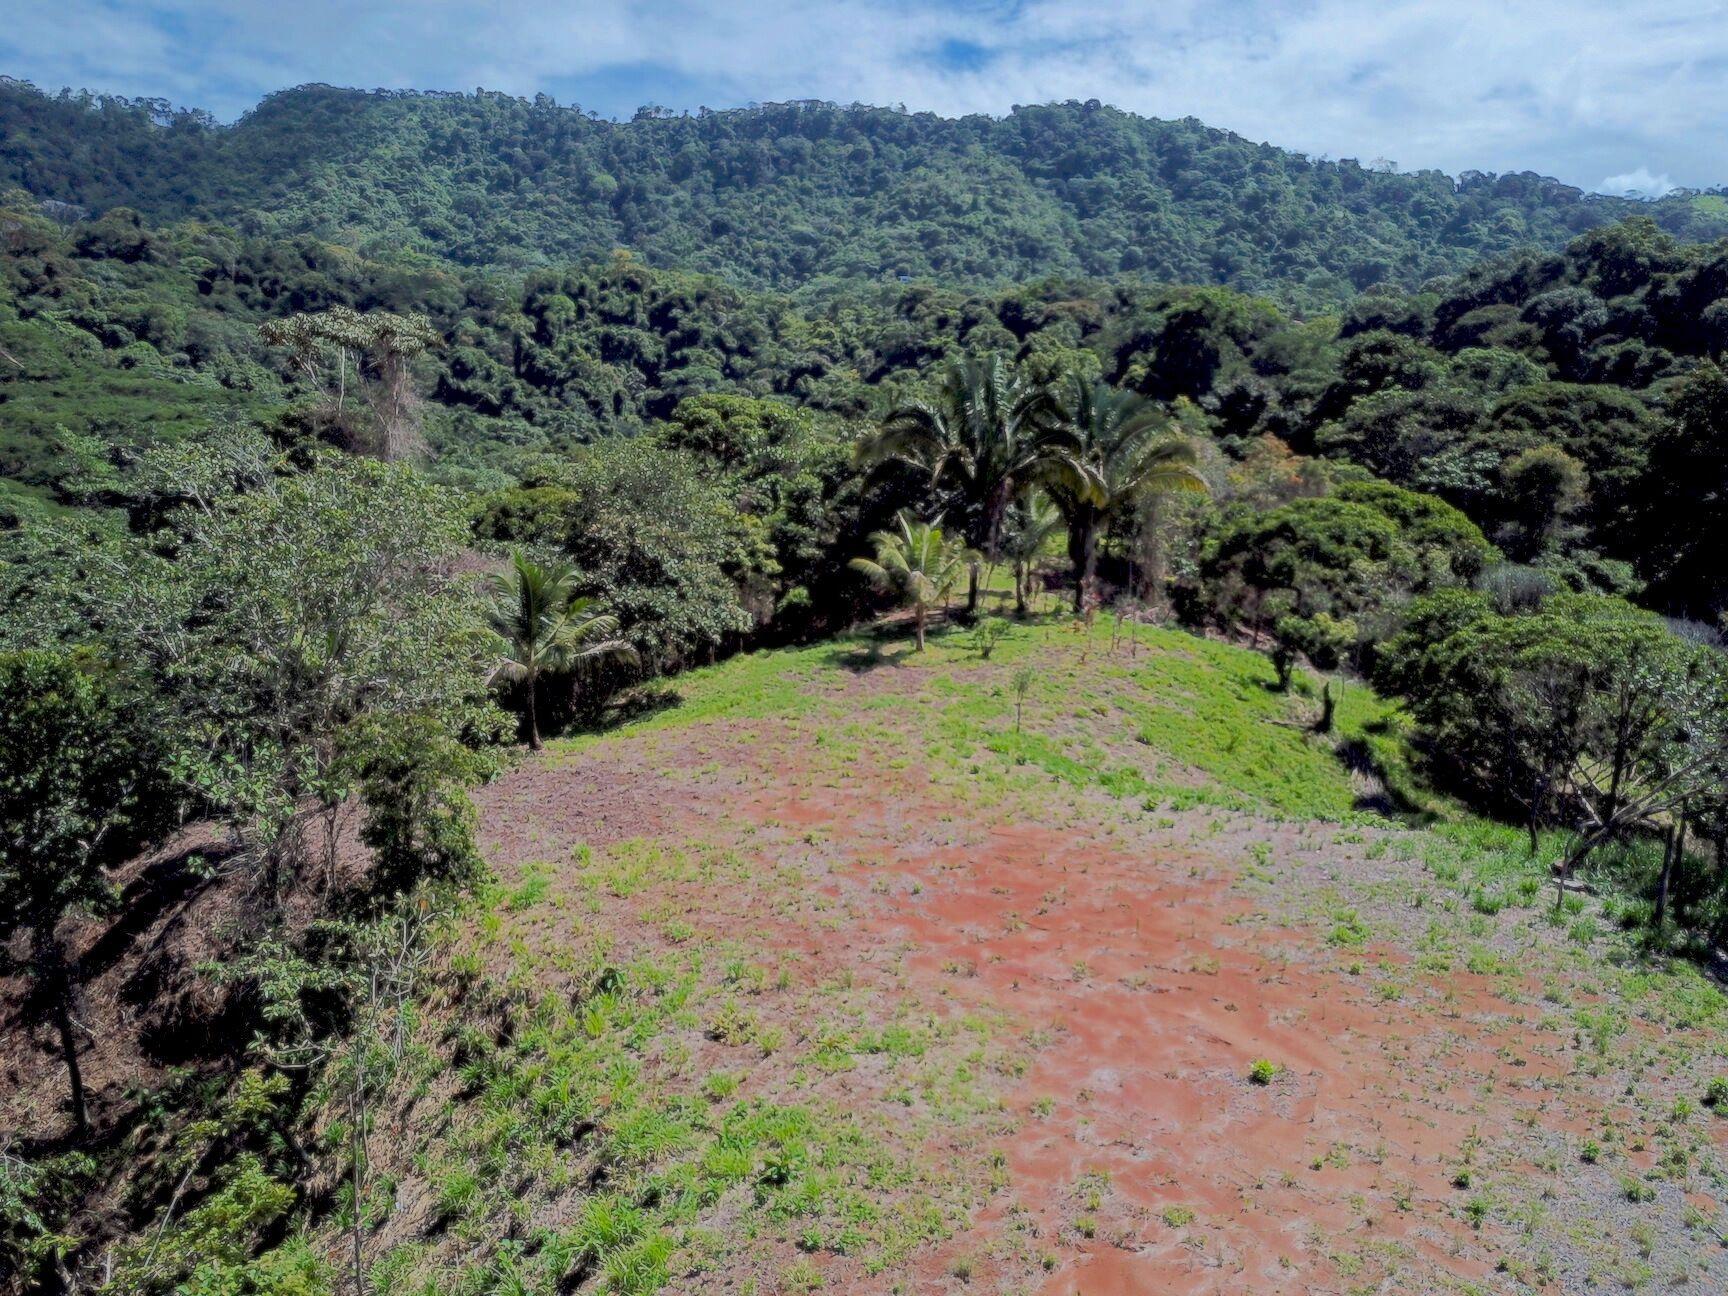 Dominical-Costa-Rica-property-costaricarealestateDOM335-9.jpeg